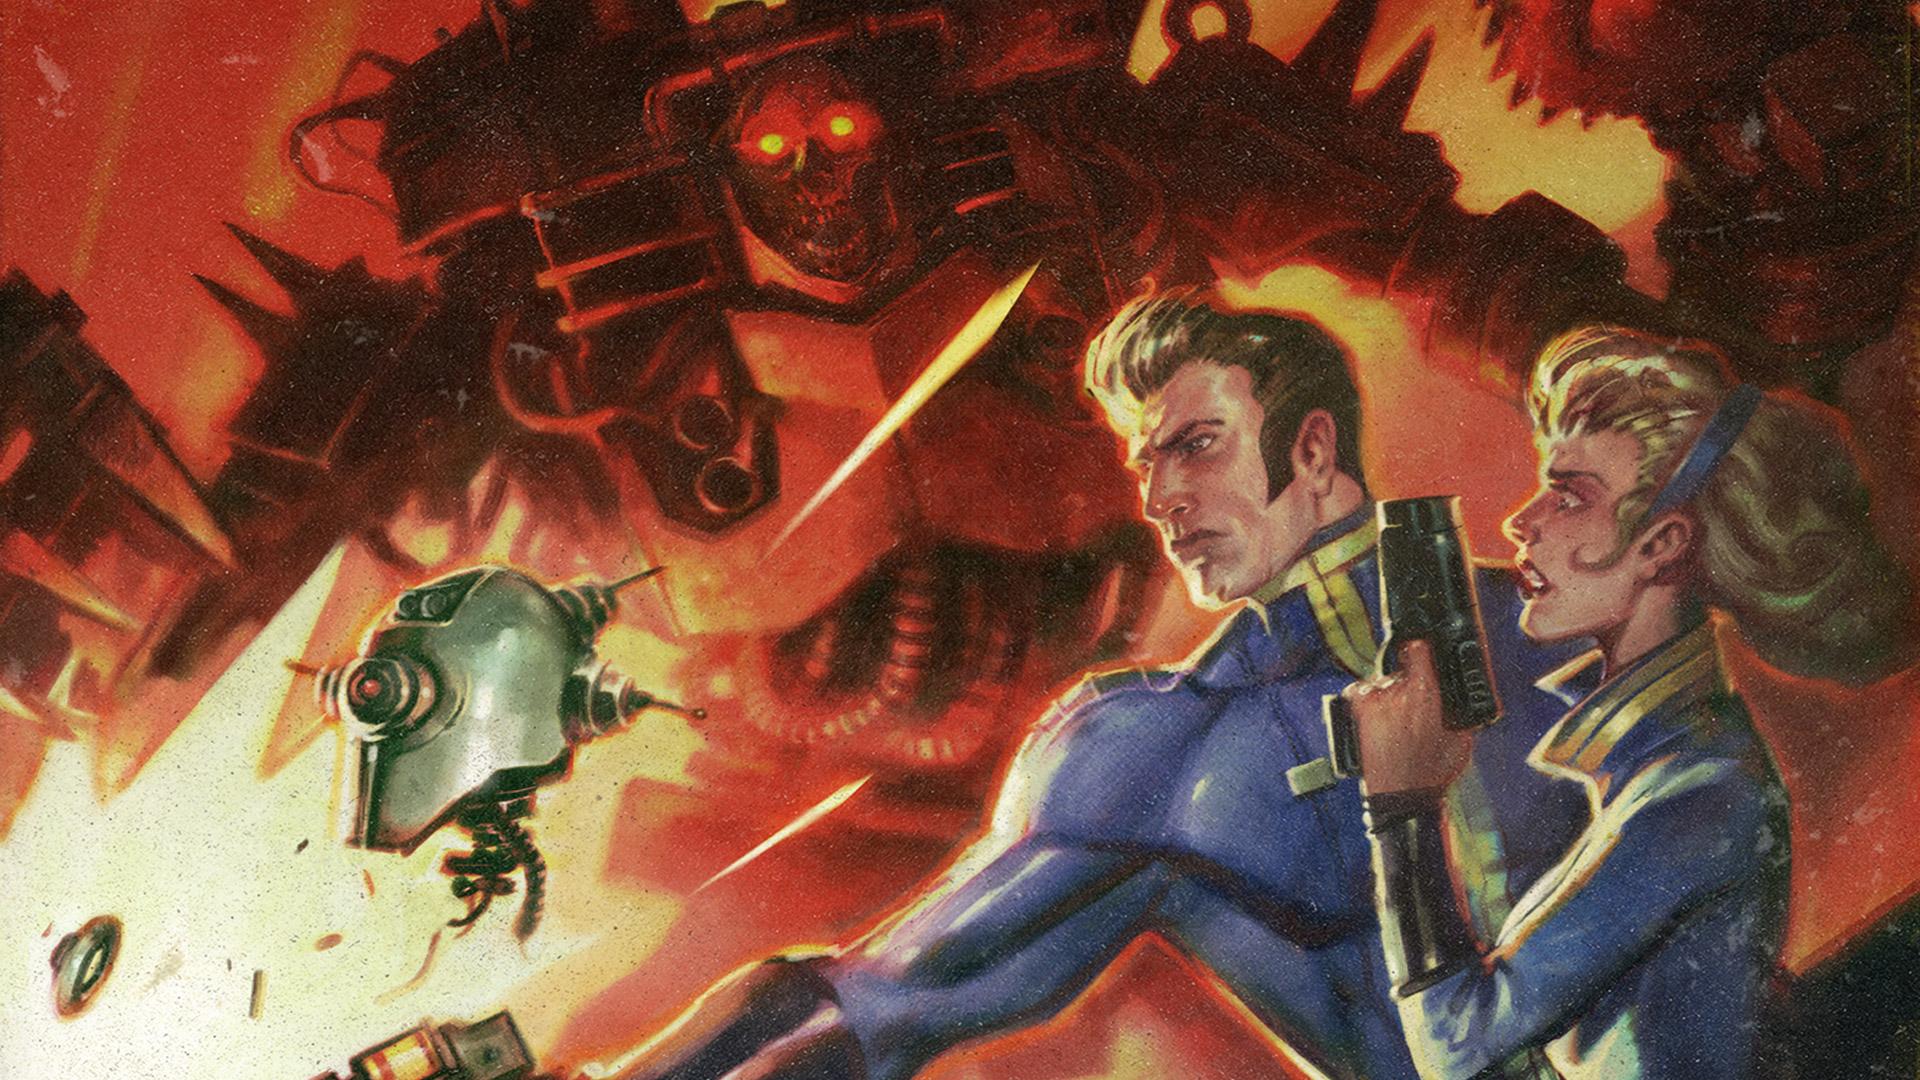 Fallout 4 Wallpaper in 1920x1080